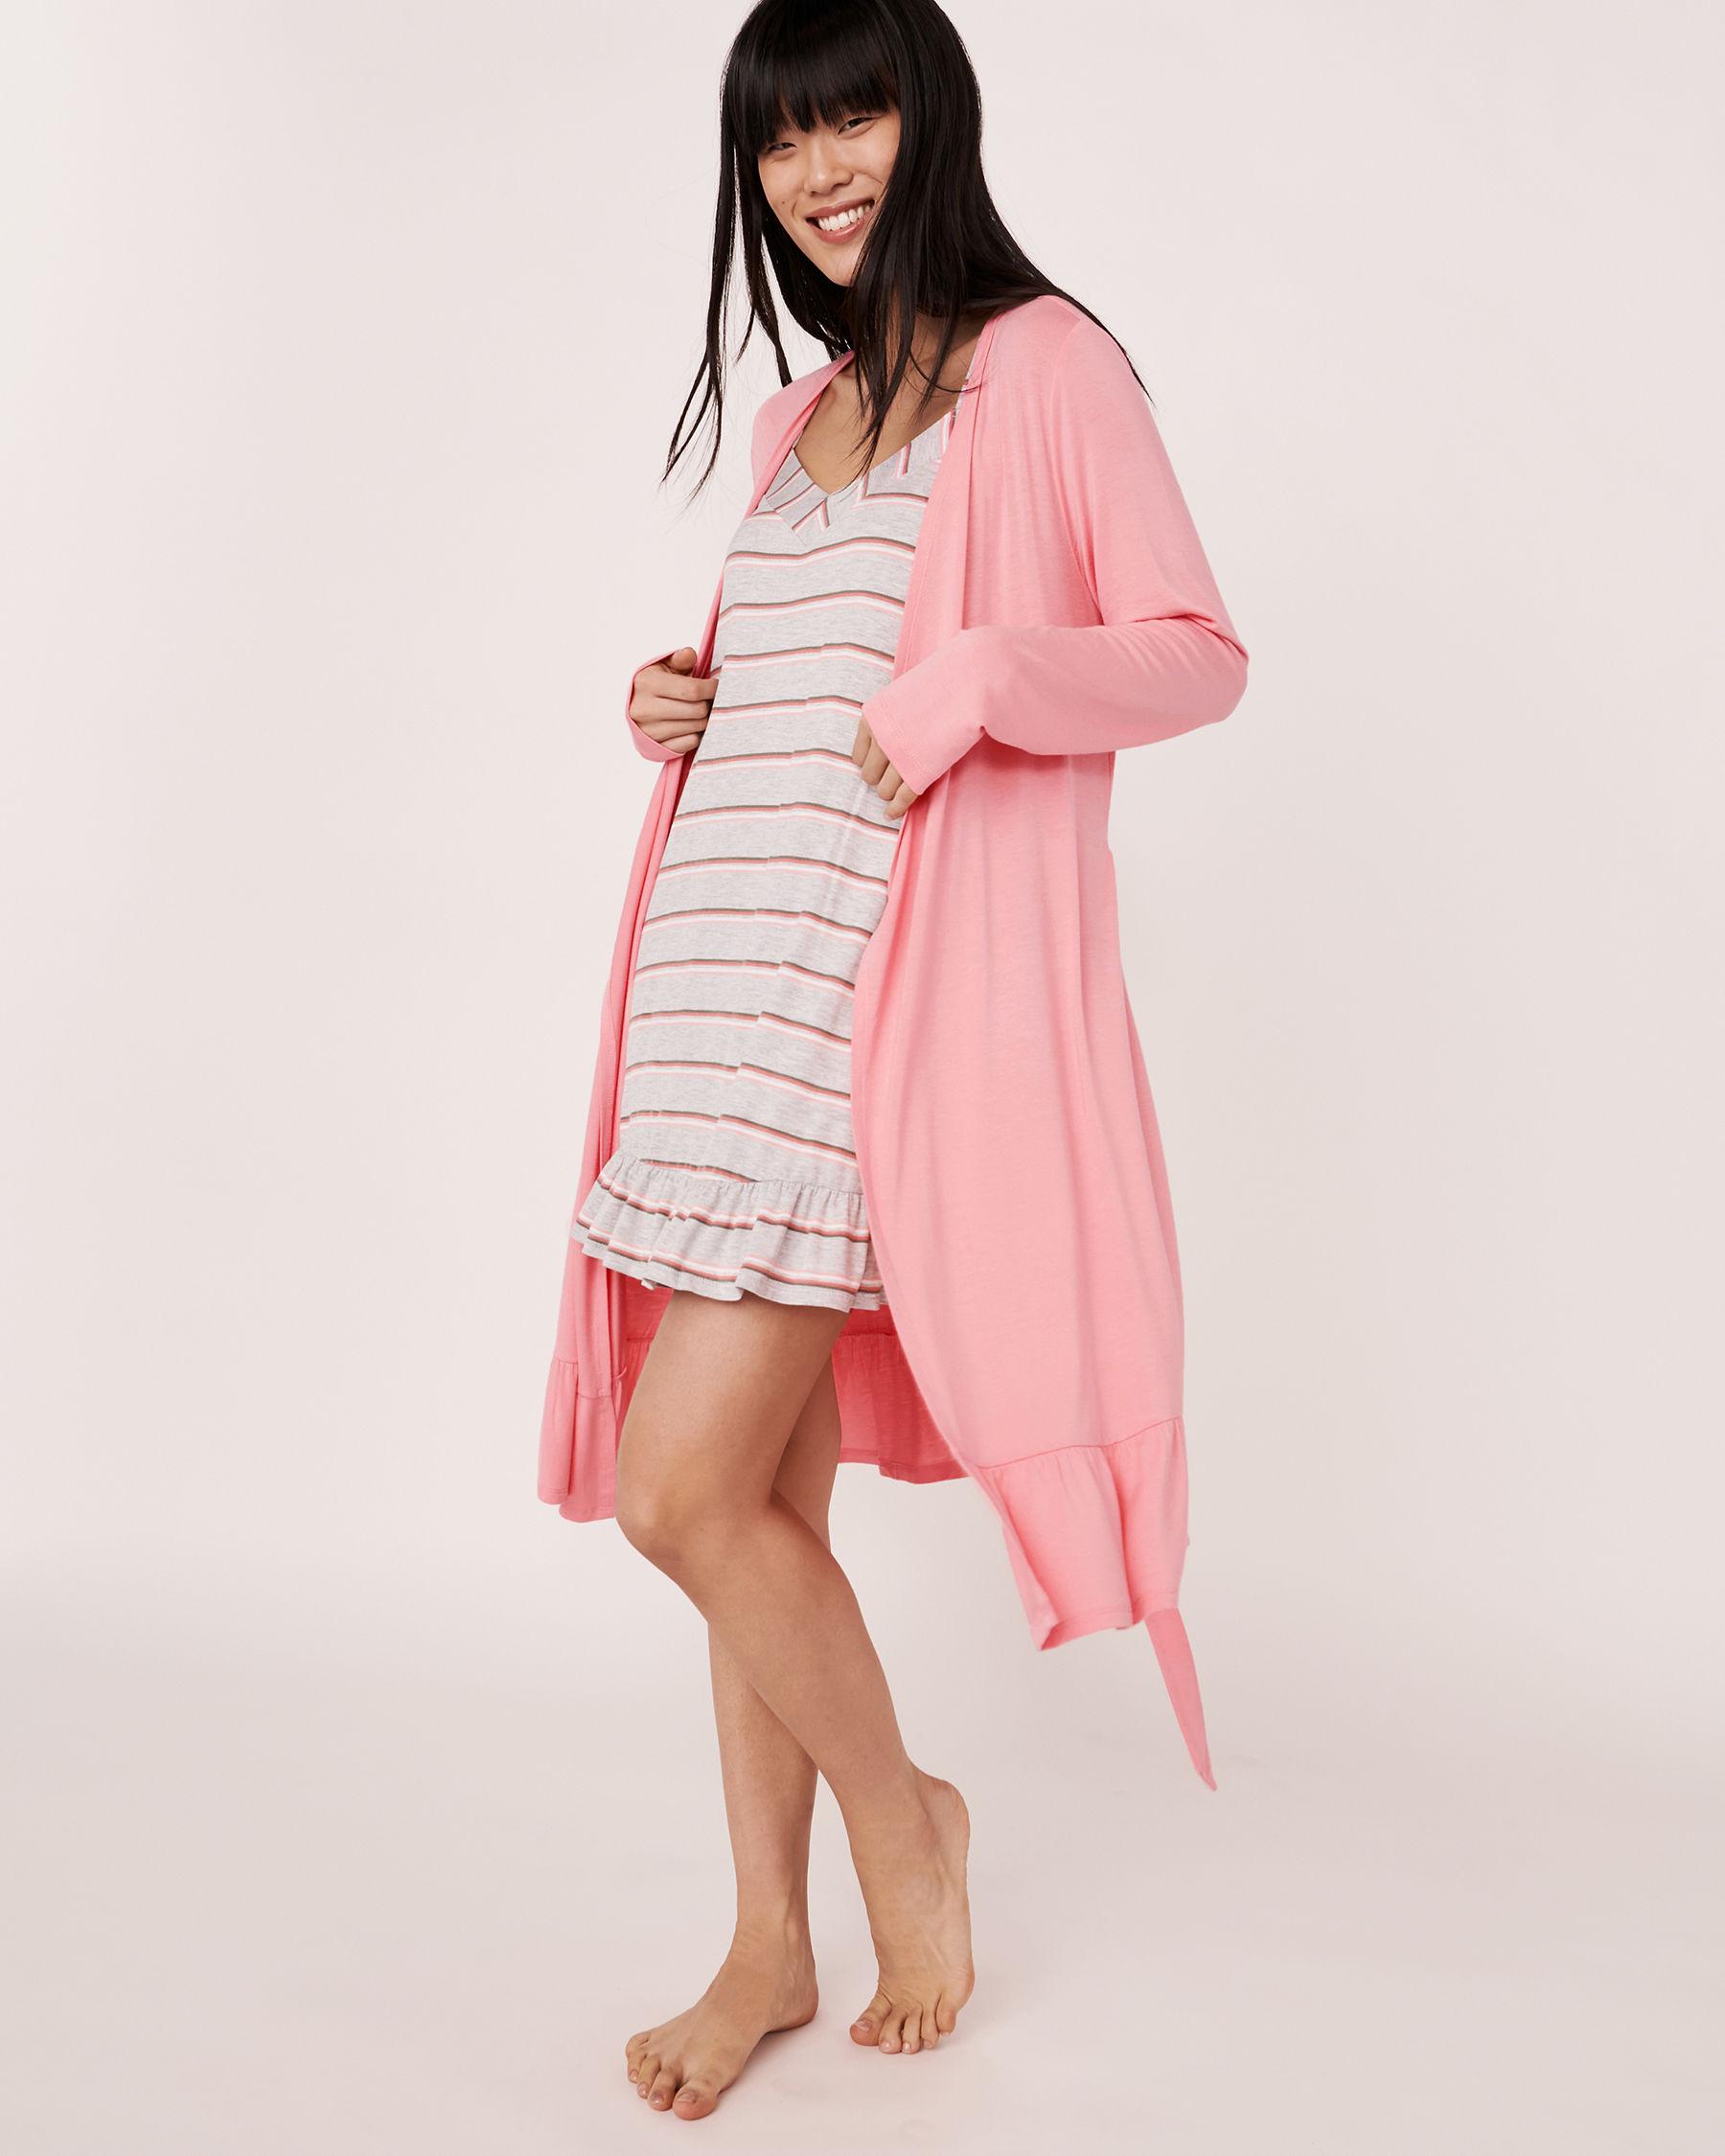 LA VIE EN ROSE Ruffle Details Robe Pink 40600007 - View3